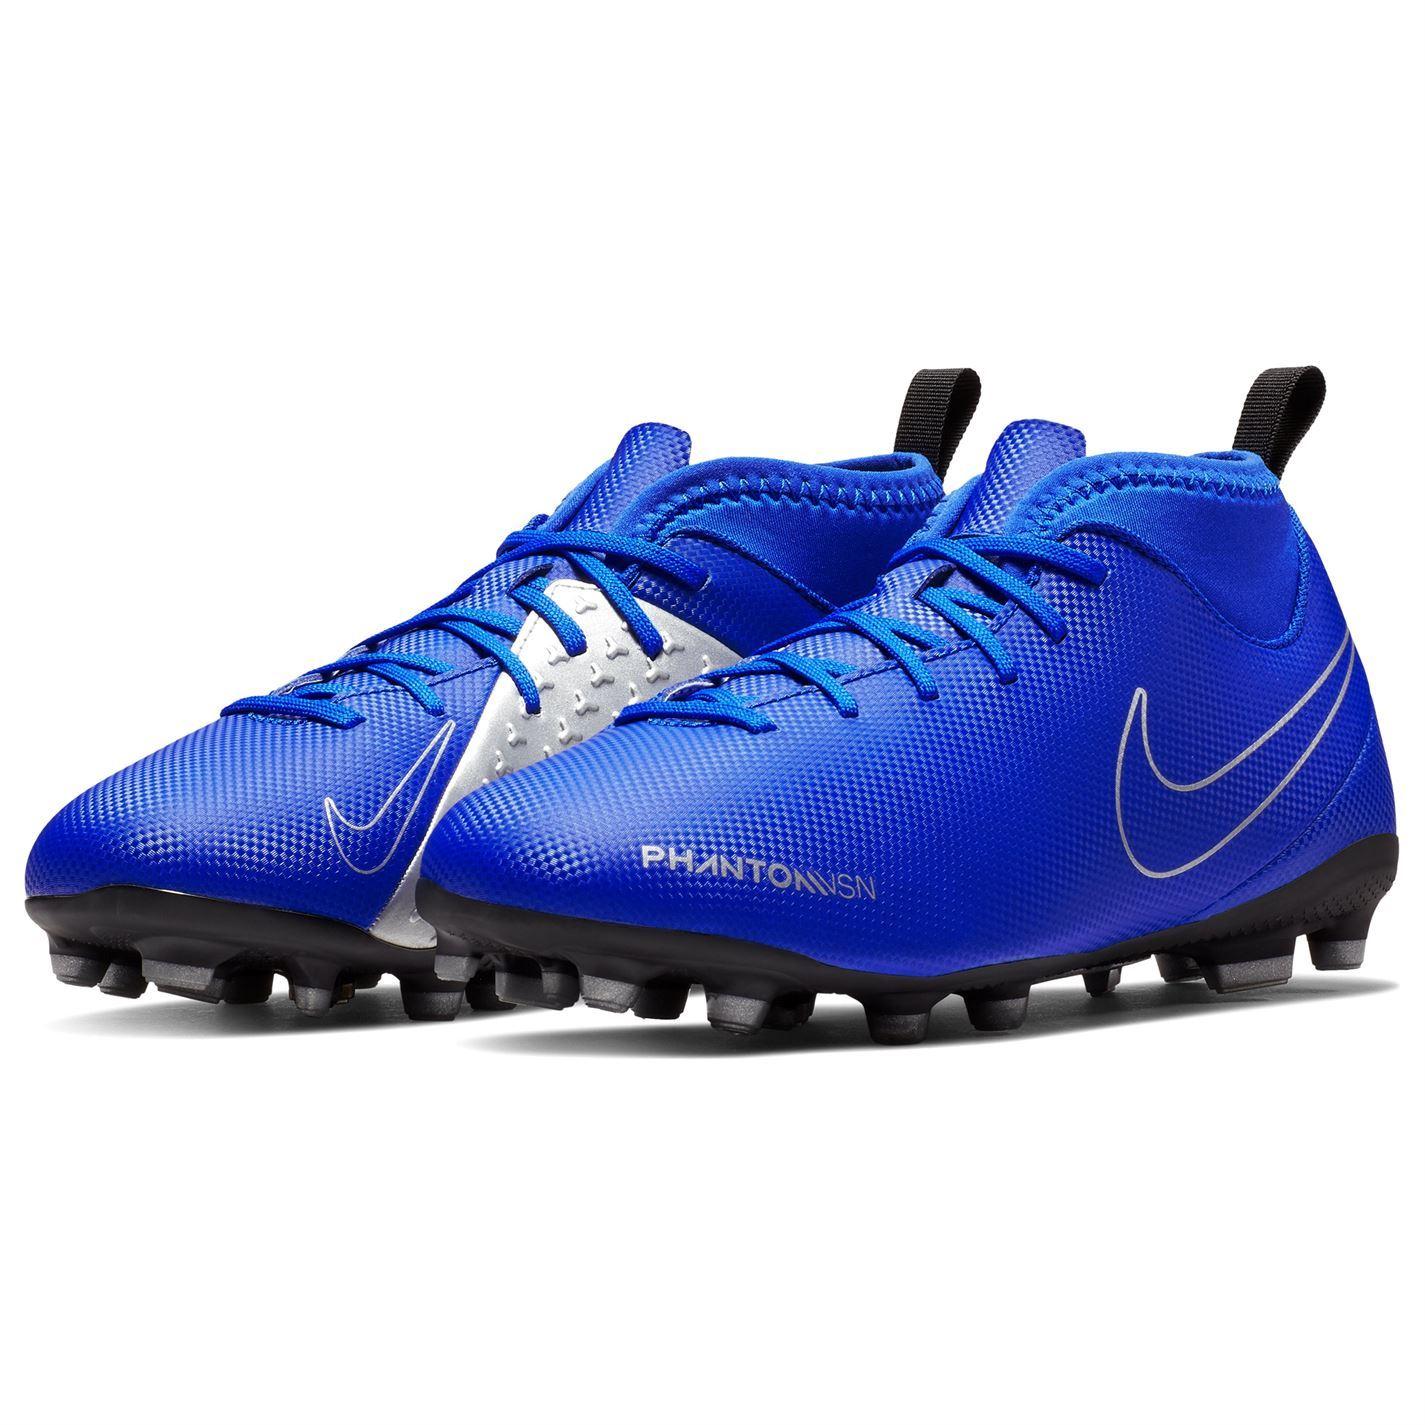 miniature 8 - Nike-Phantom-Vision-Club-DF-FG-Firm-Ground-Chaussures-De-Football-Juniors-Football-Crampons